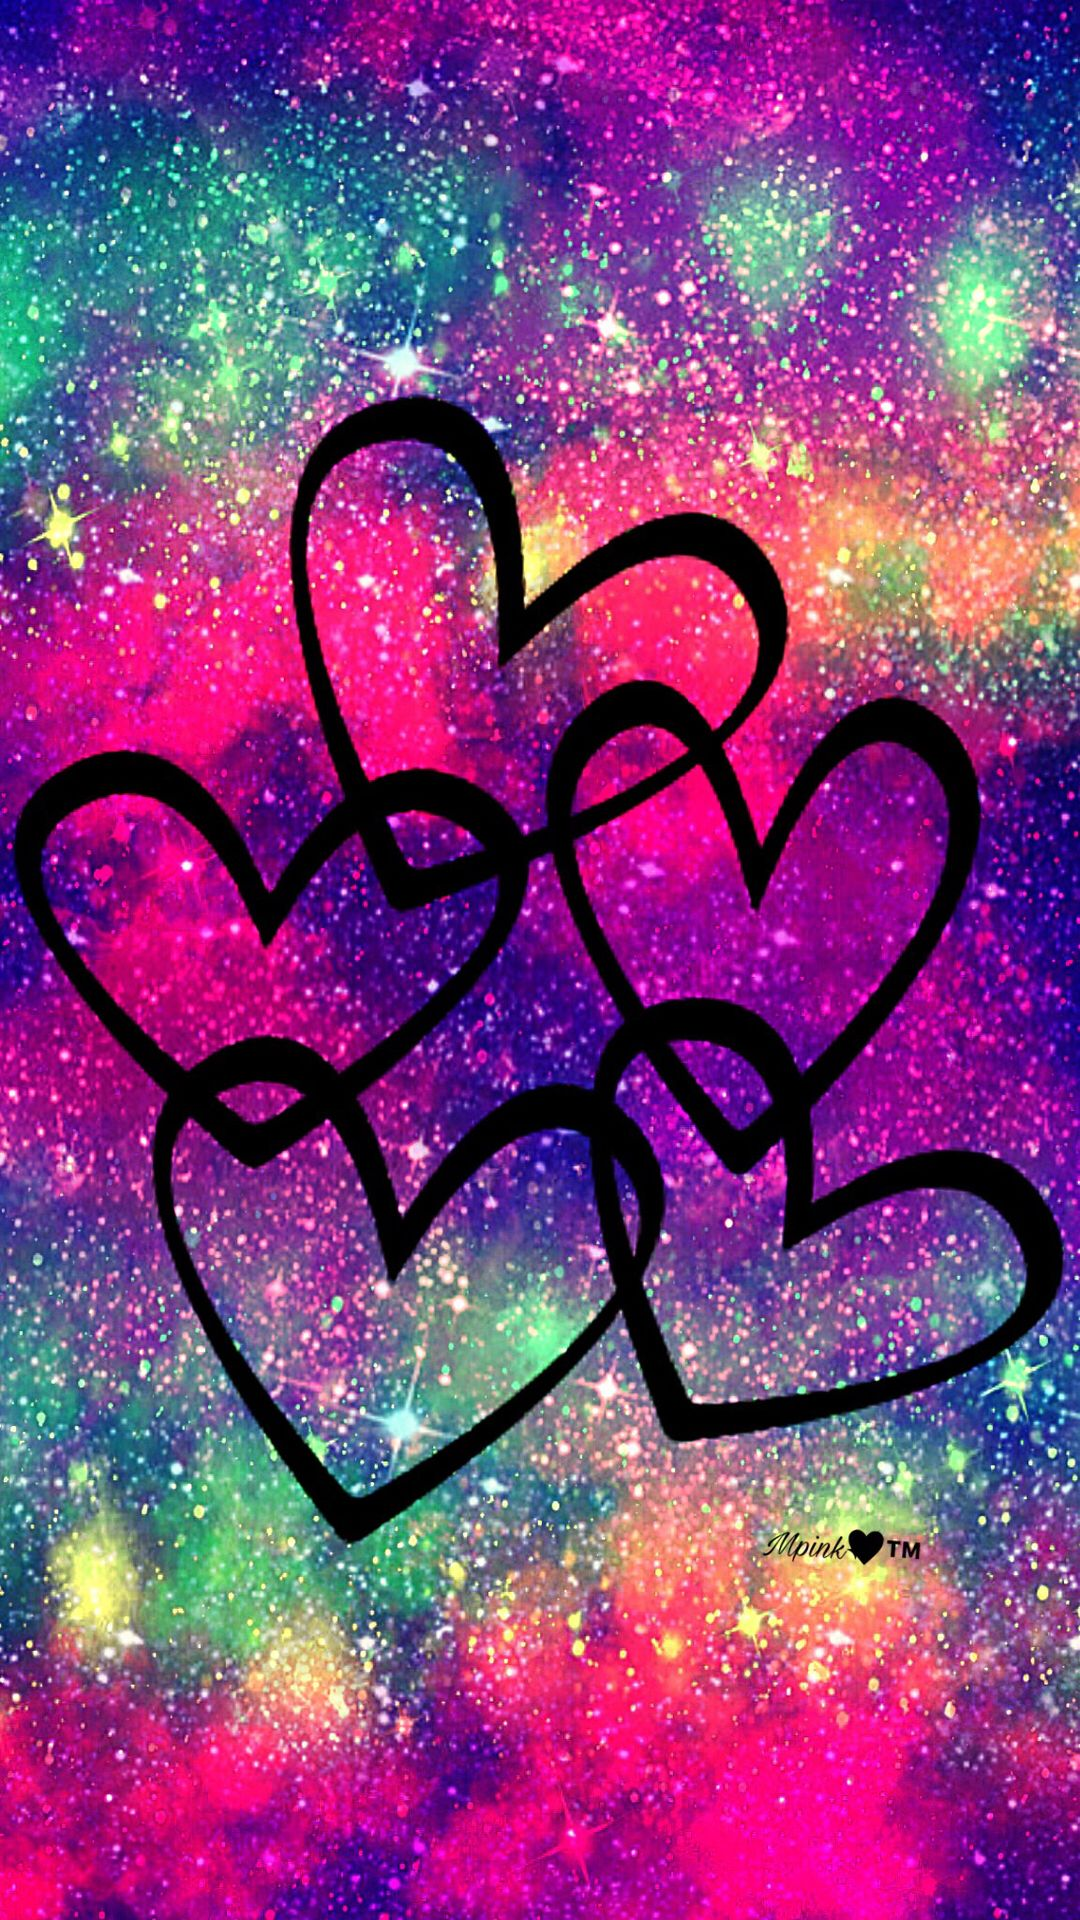 Rainbow Hearts Galaxy Wallpaper androidwallpaper iphonewallpaper